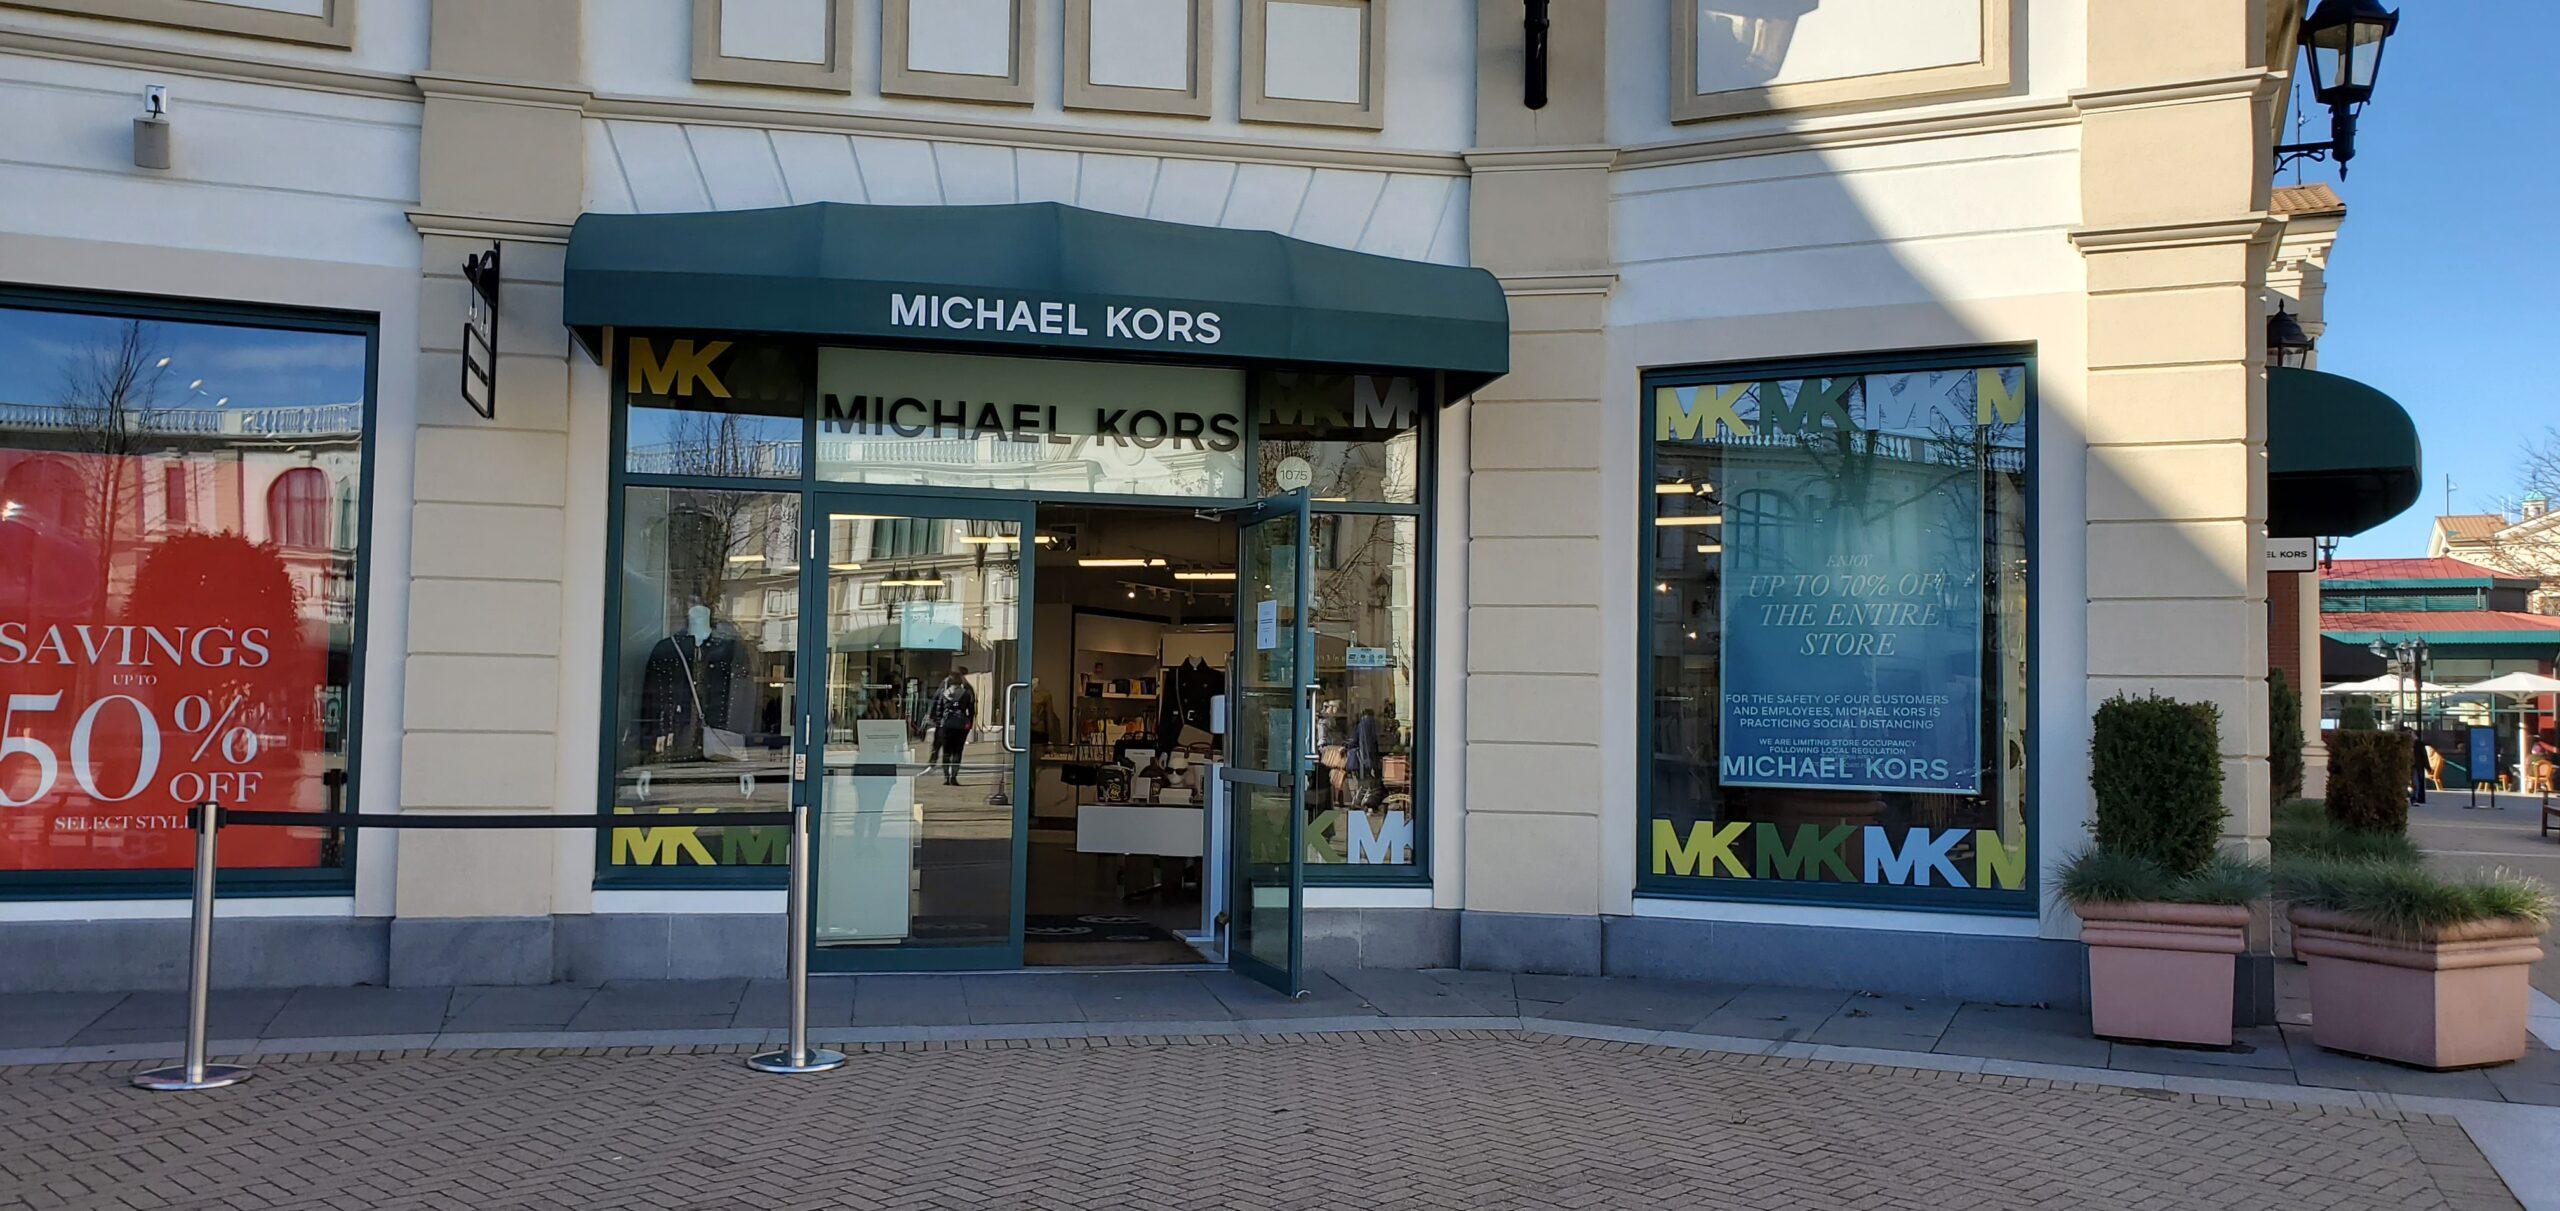 Michael Kors at McArthur Glen Vancouver